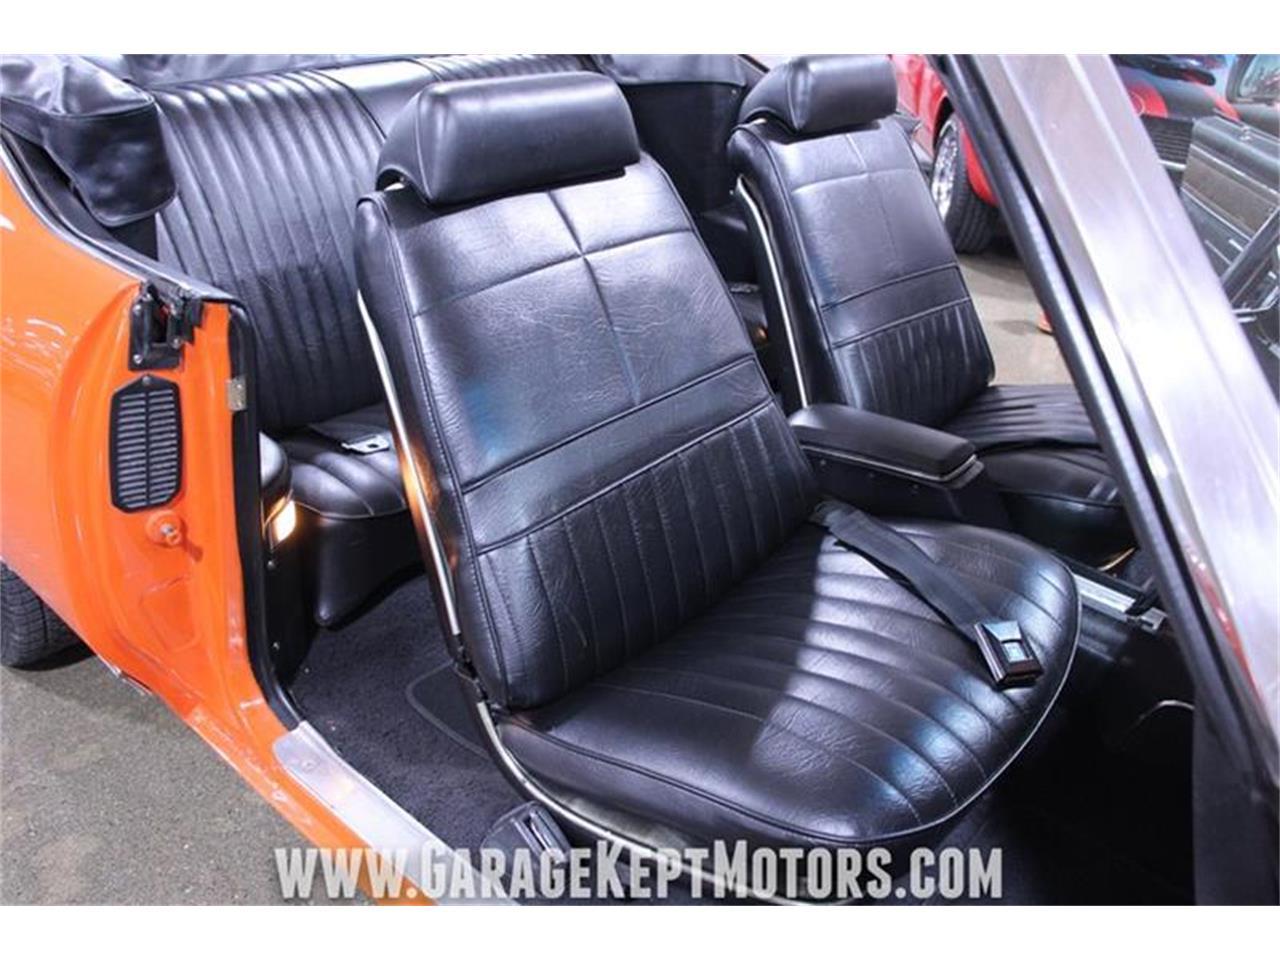 For Sale: 1970 Oldsmobile Cutlass in Grand Rapids, Michigan